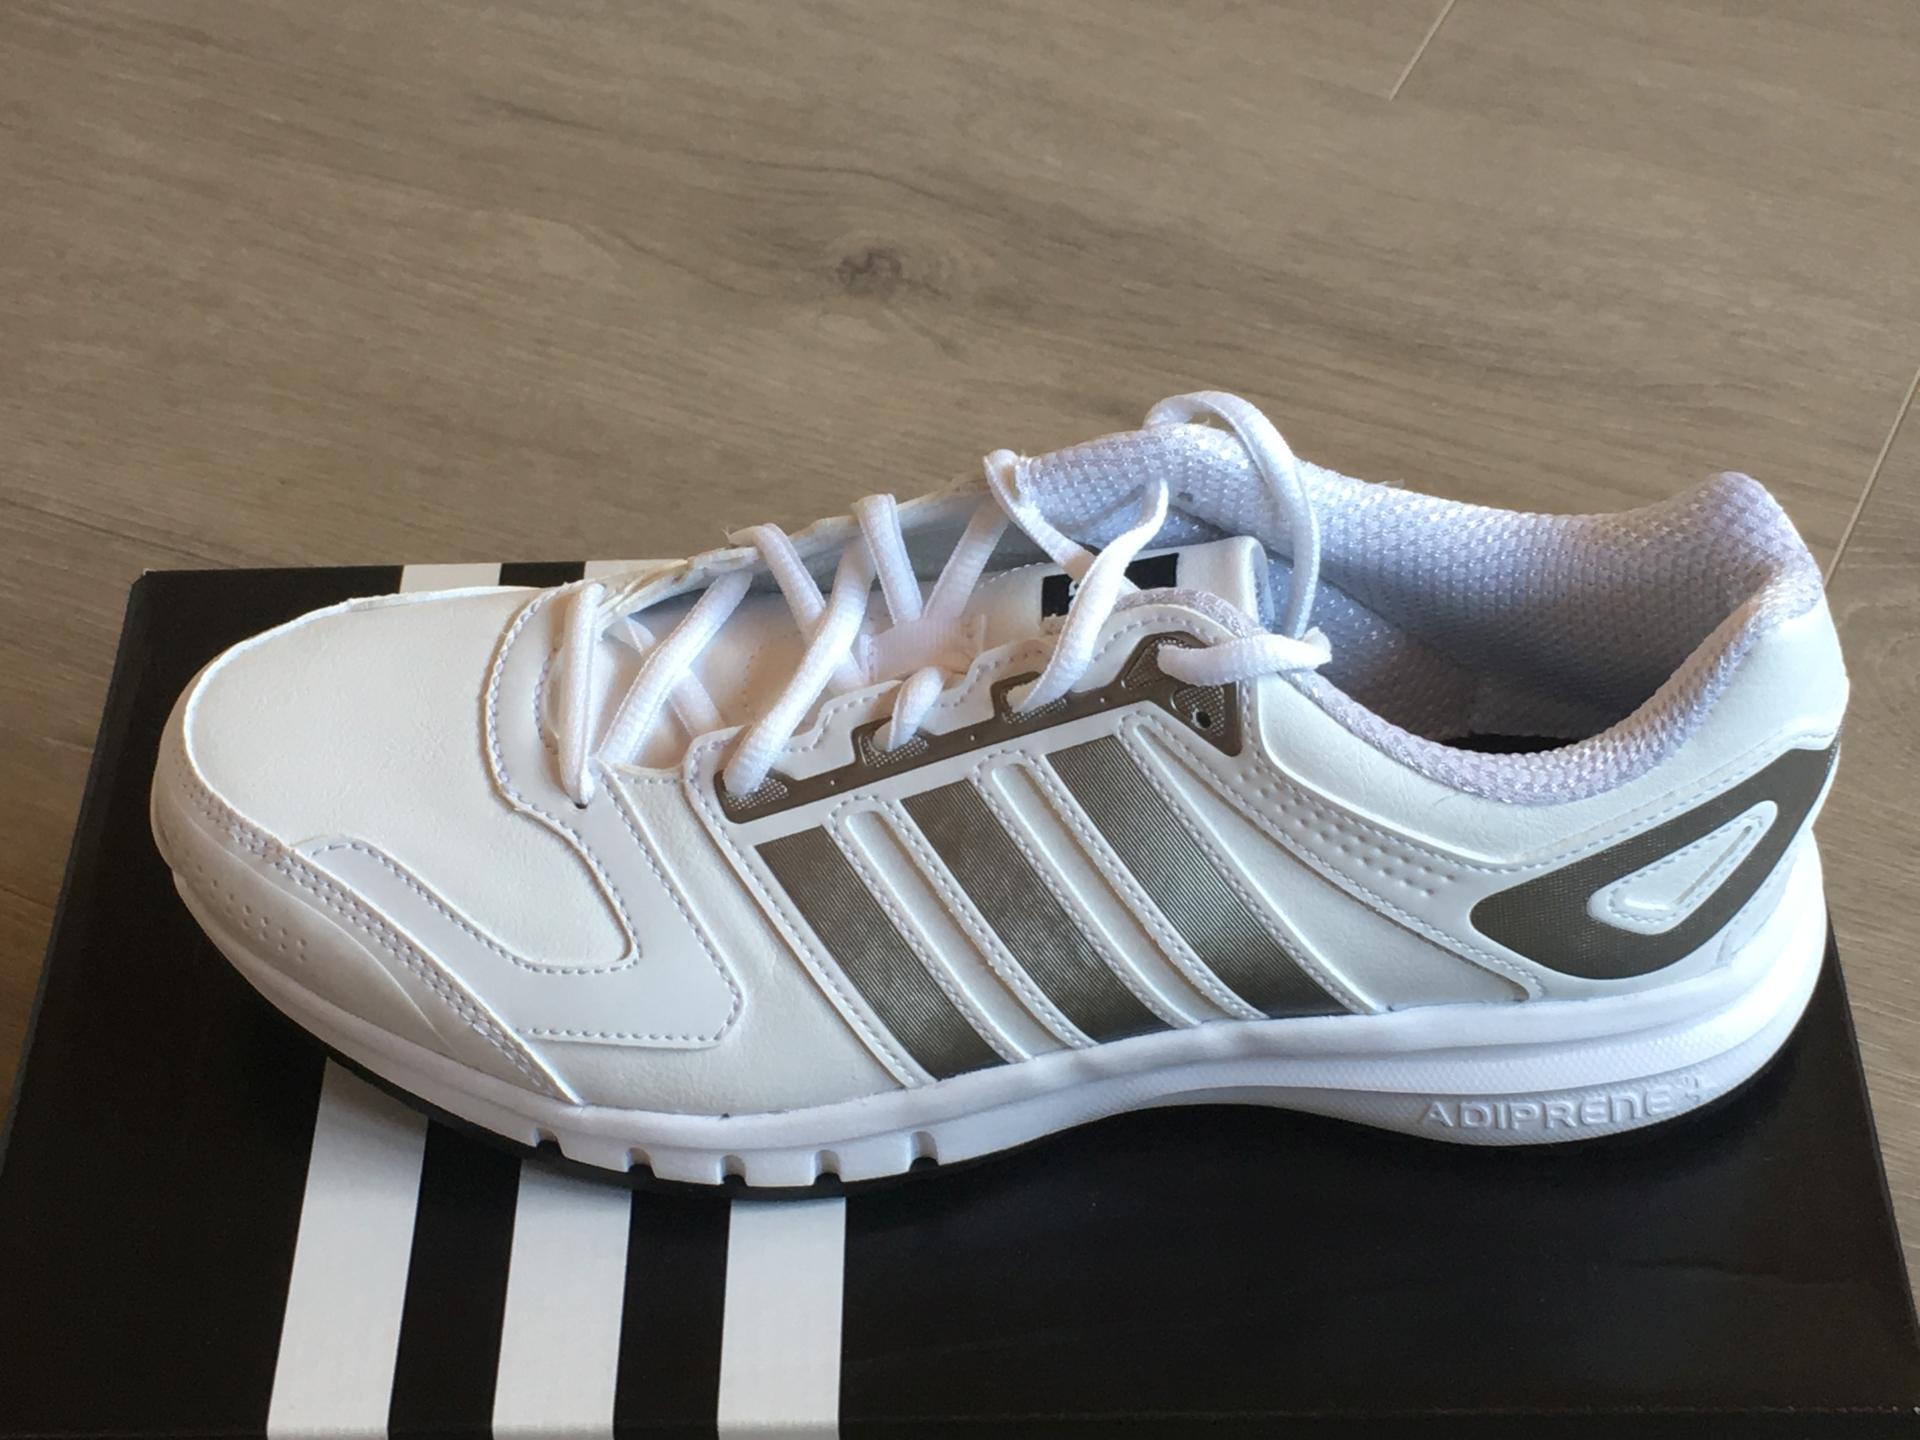 Details zu Adidas Galaxy LEA M Herren weiß silber Laufschuhe Sneaker Schuhe Jogging M21899